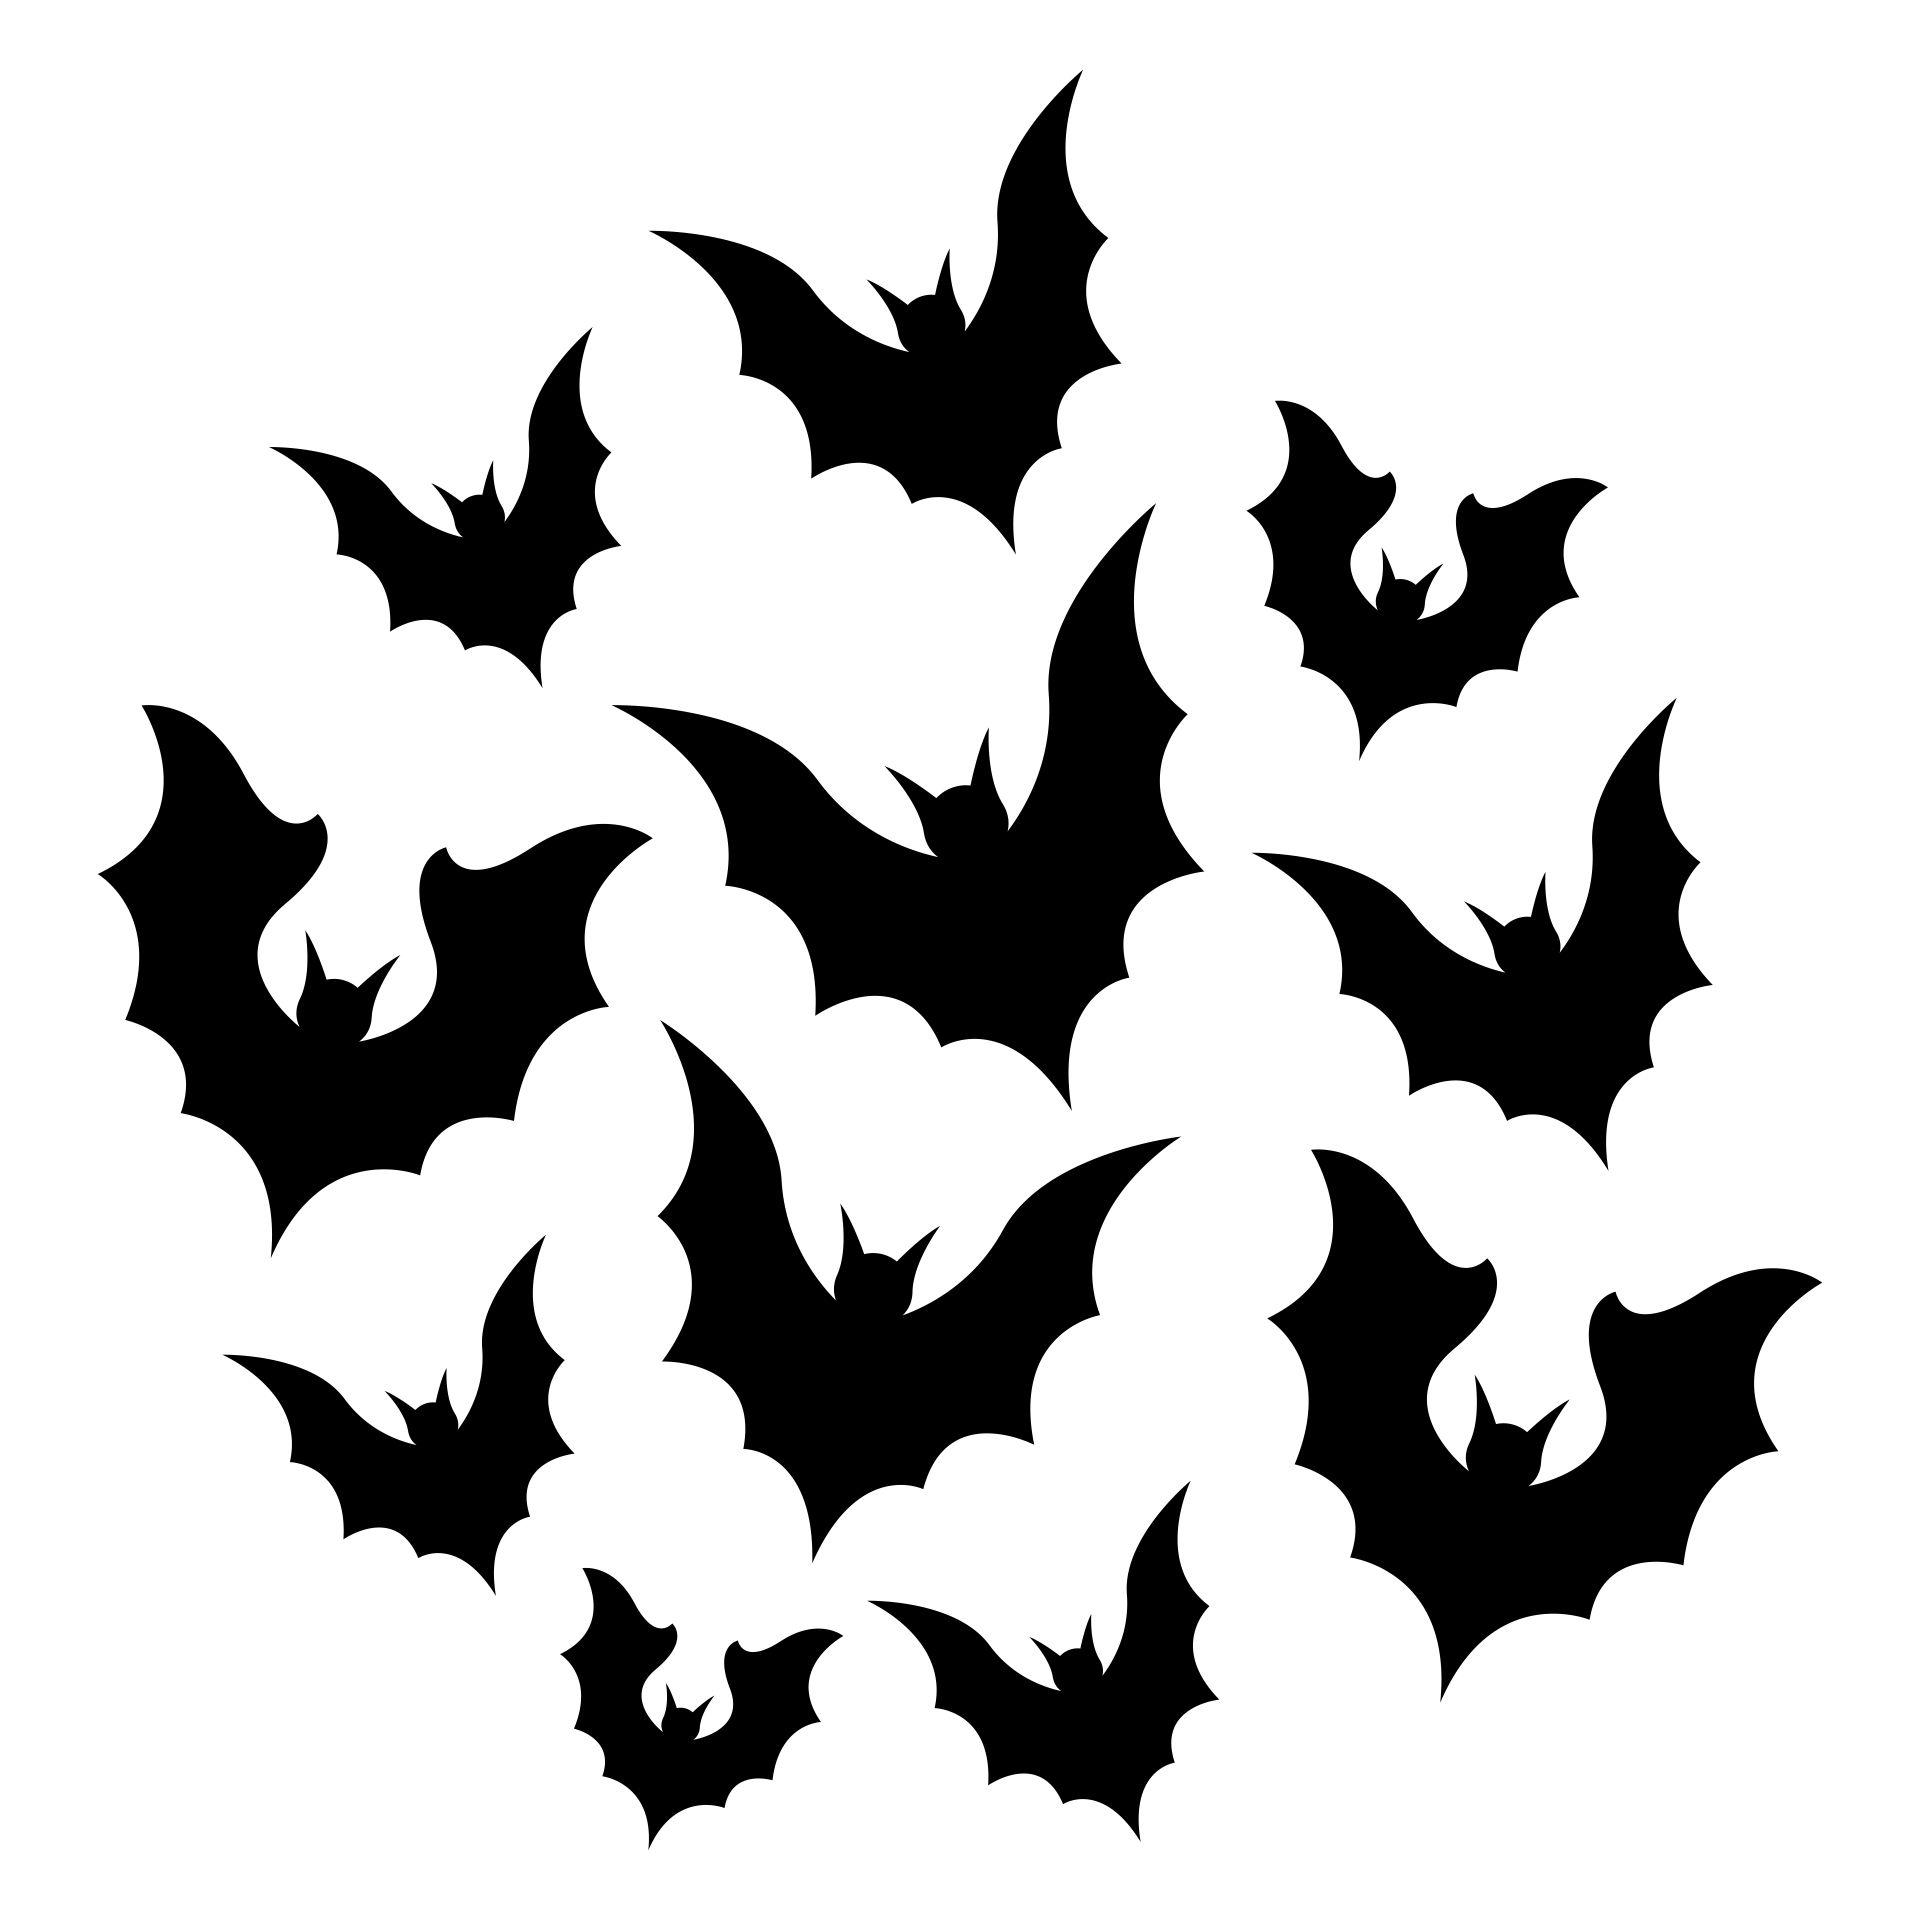 Printable Halloween Decorations Bat Template